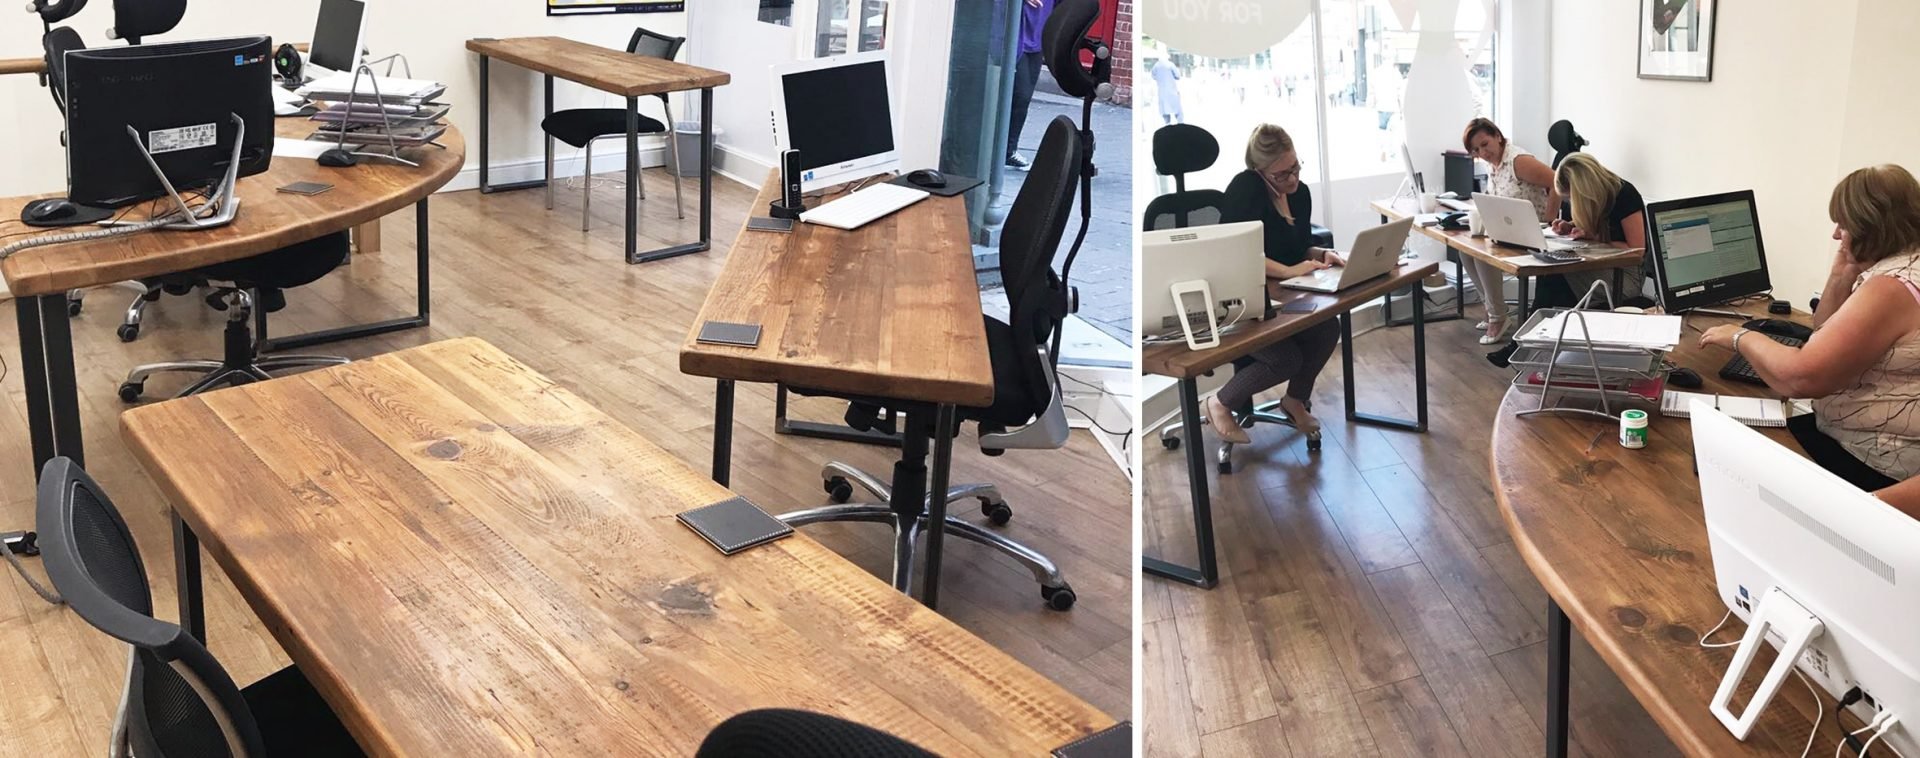 Castlegate Office Furniture